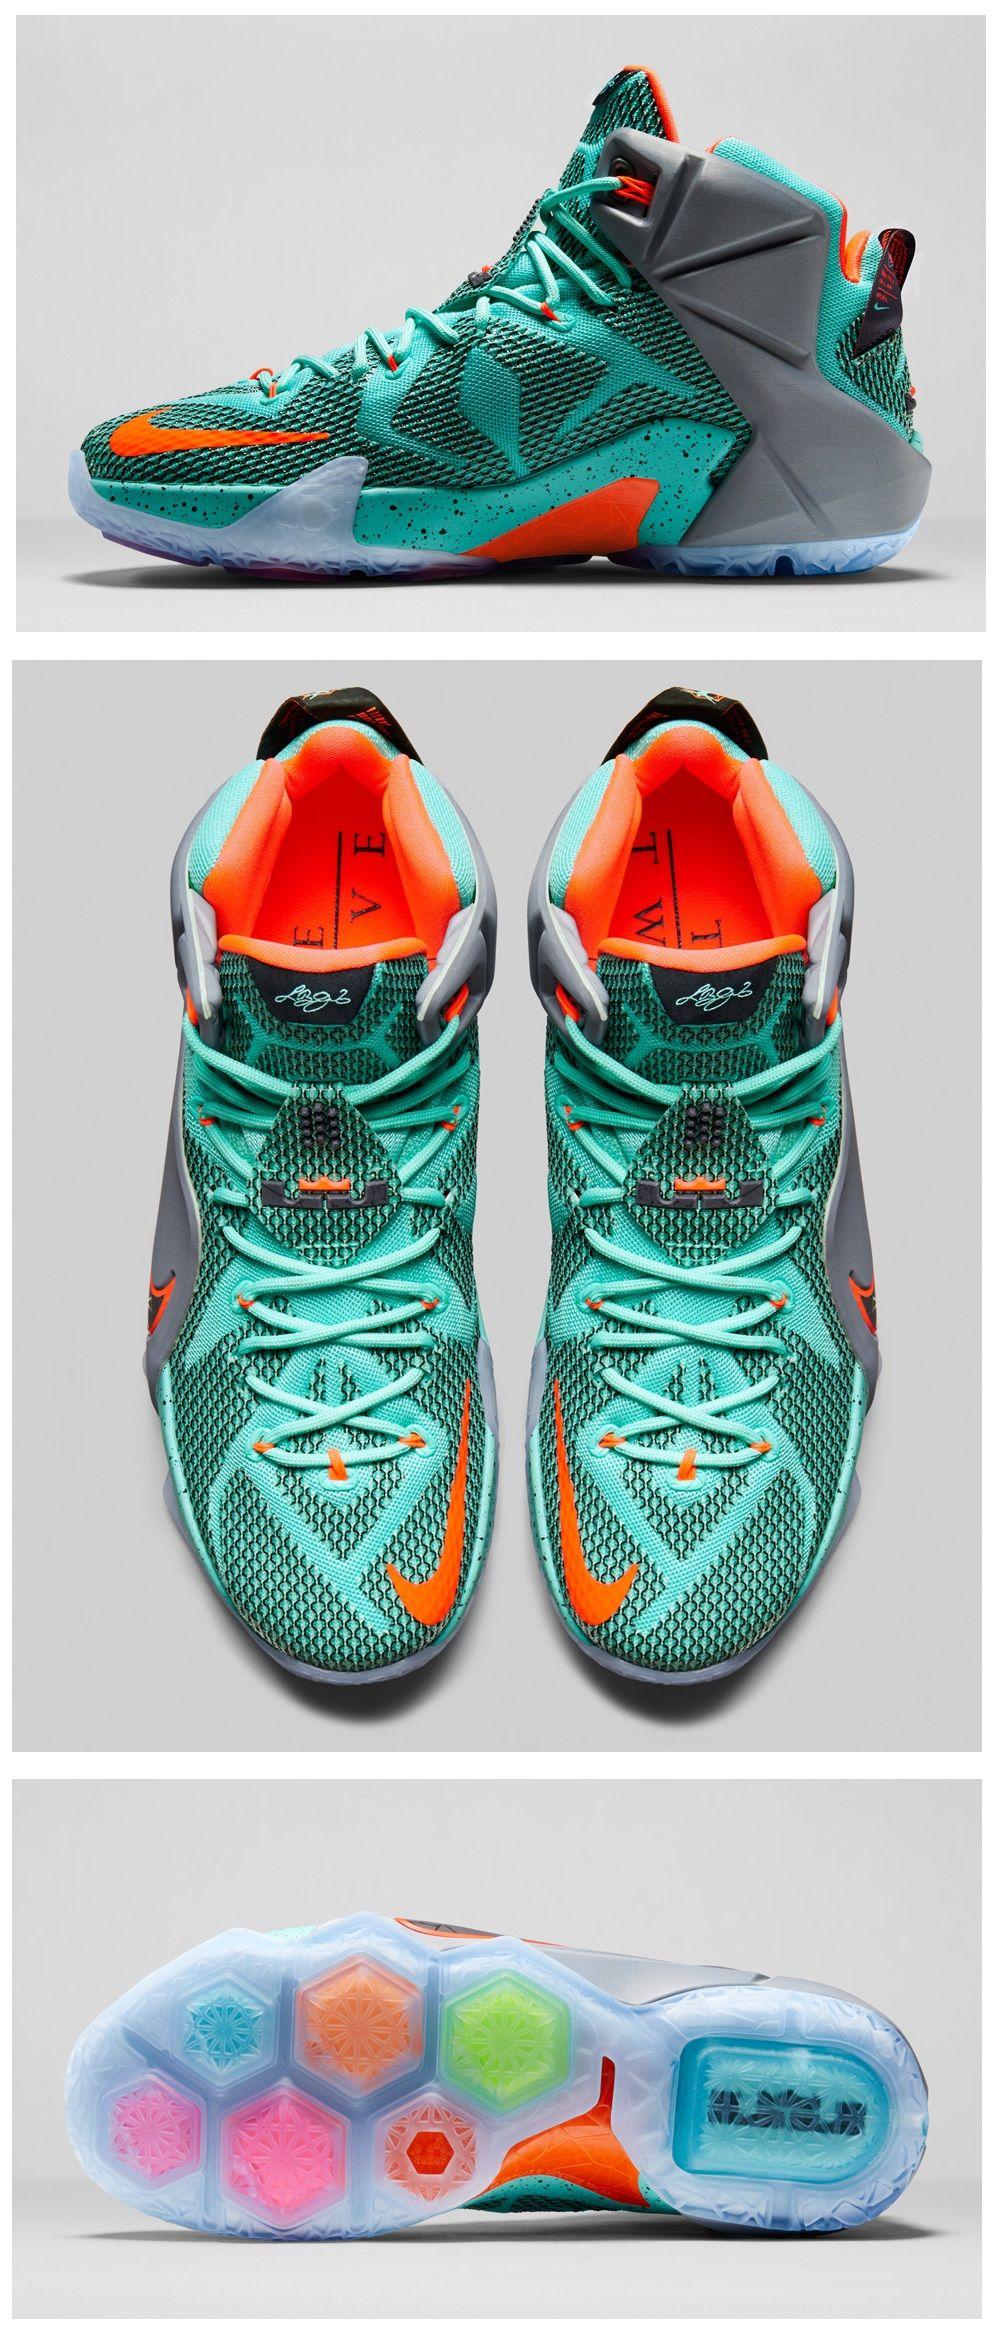 1e672d6a339 Nike LeBron 12 TipChallenger